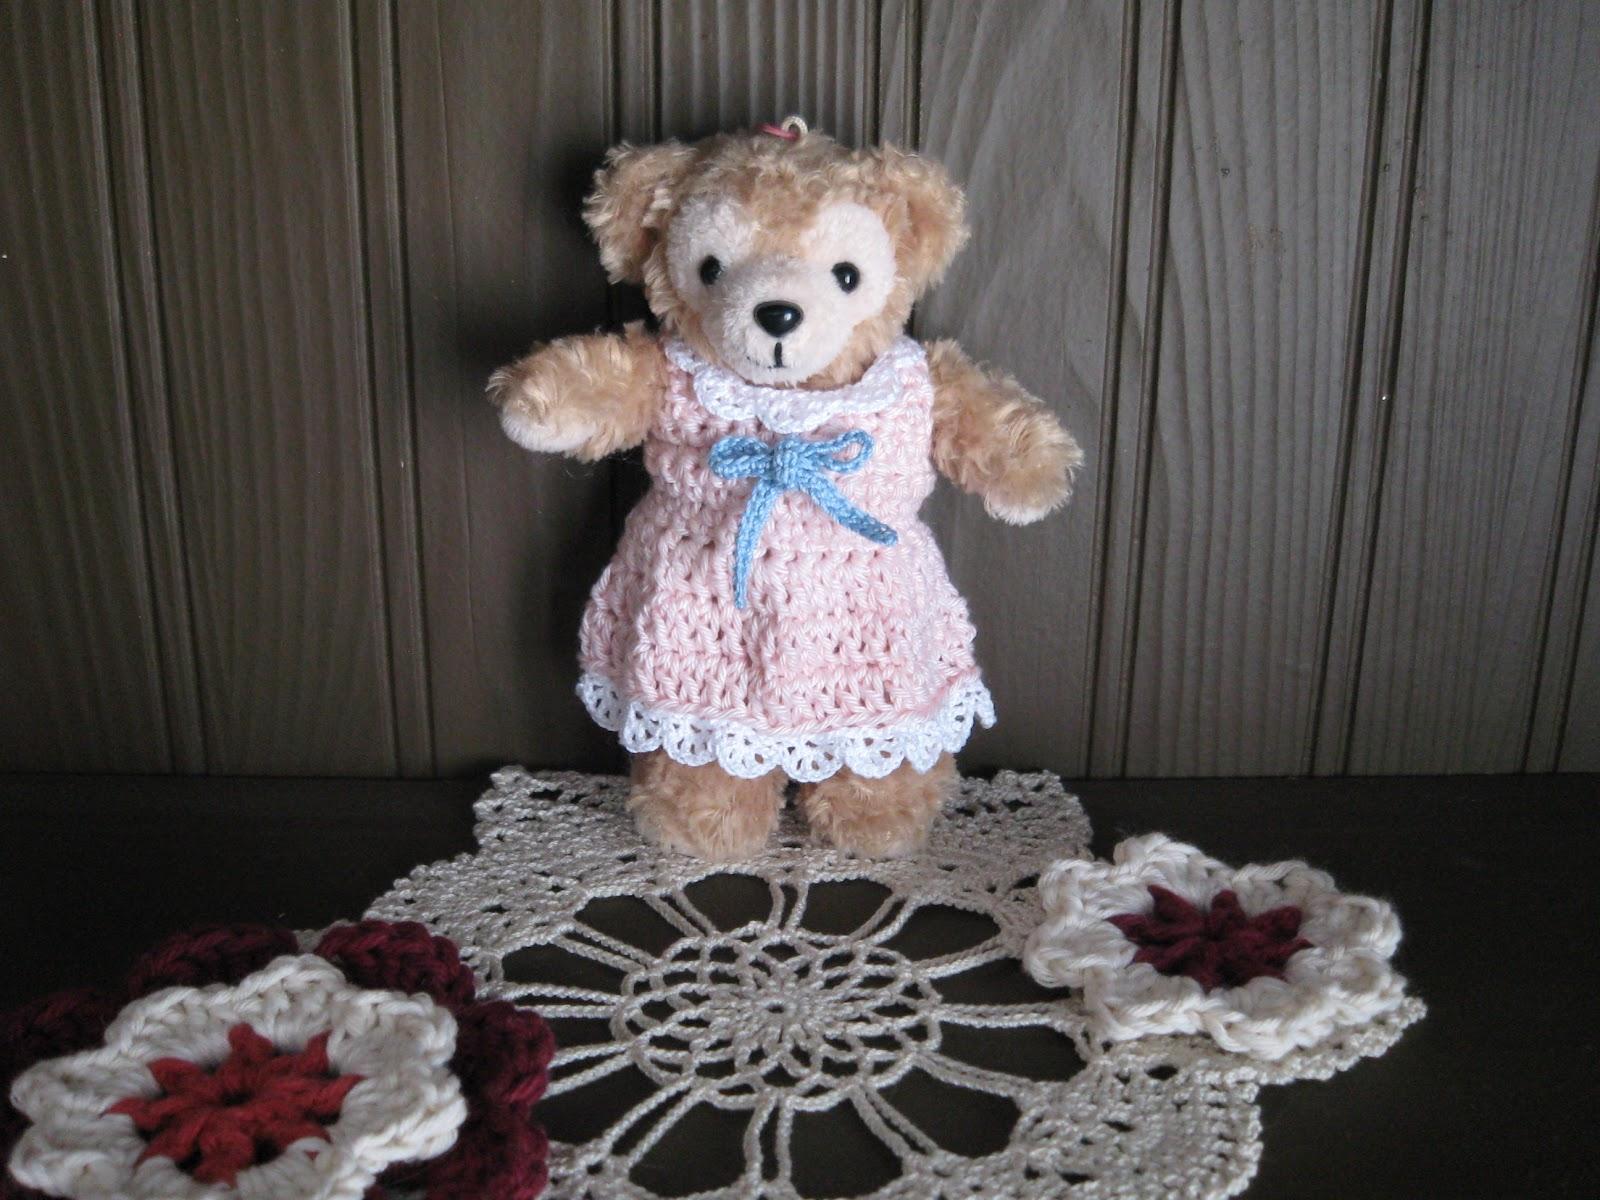 Amigurumi Disney Livre : Crochet Machine: Crochet spring one-piece for stuffed animal